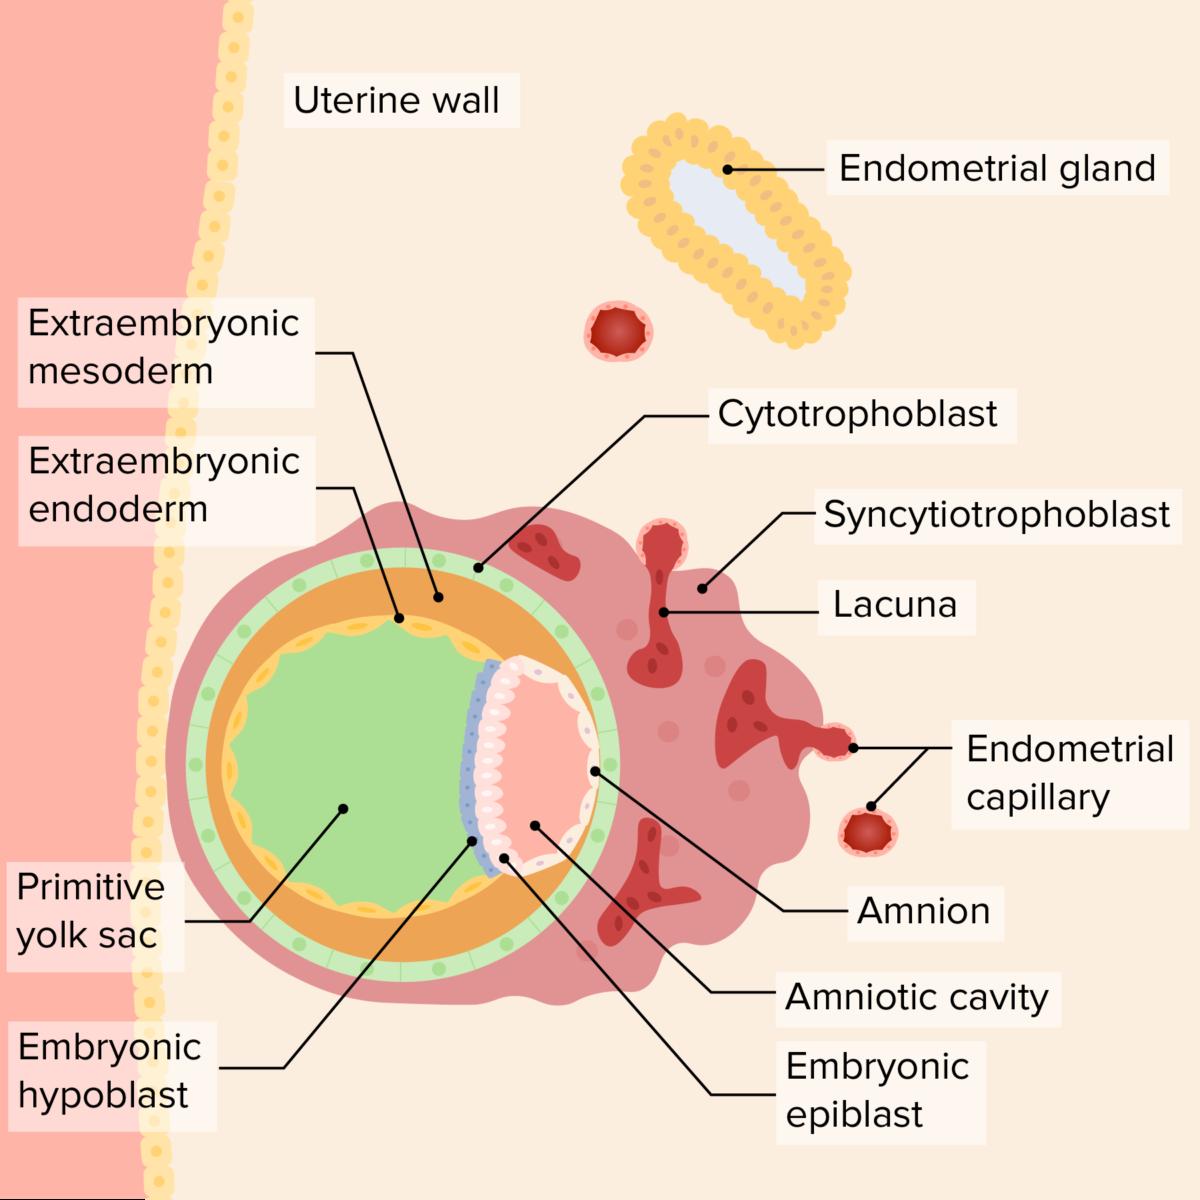 Implanted blastocyst